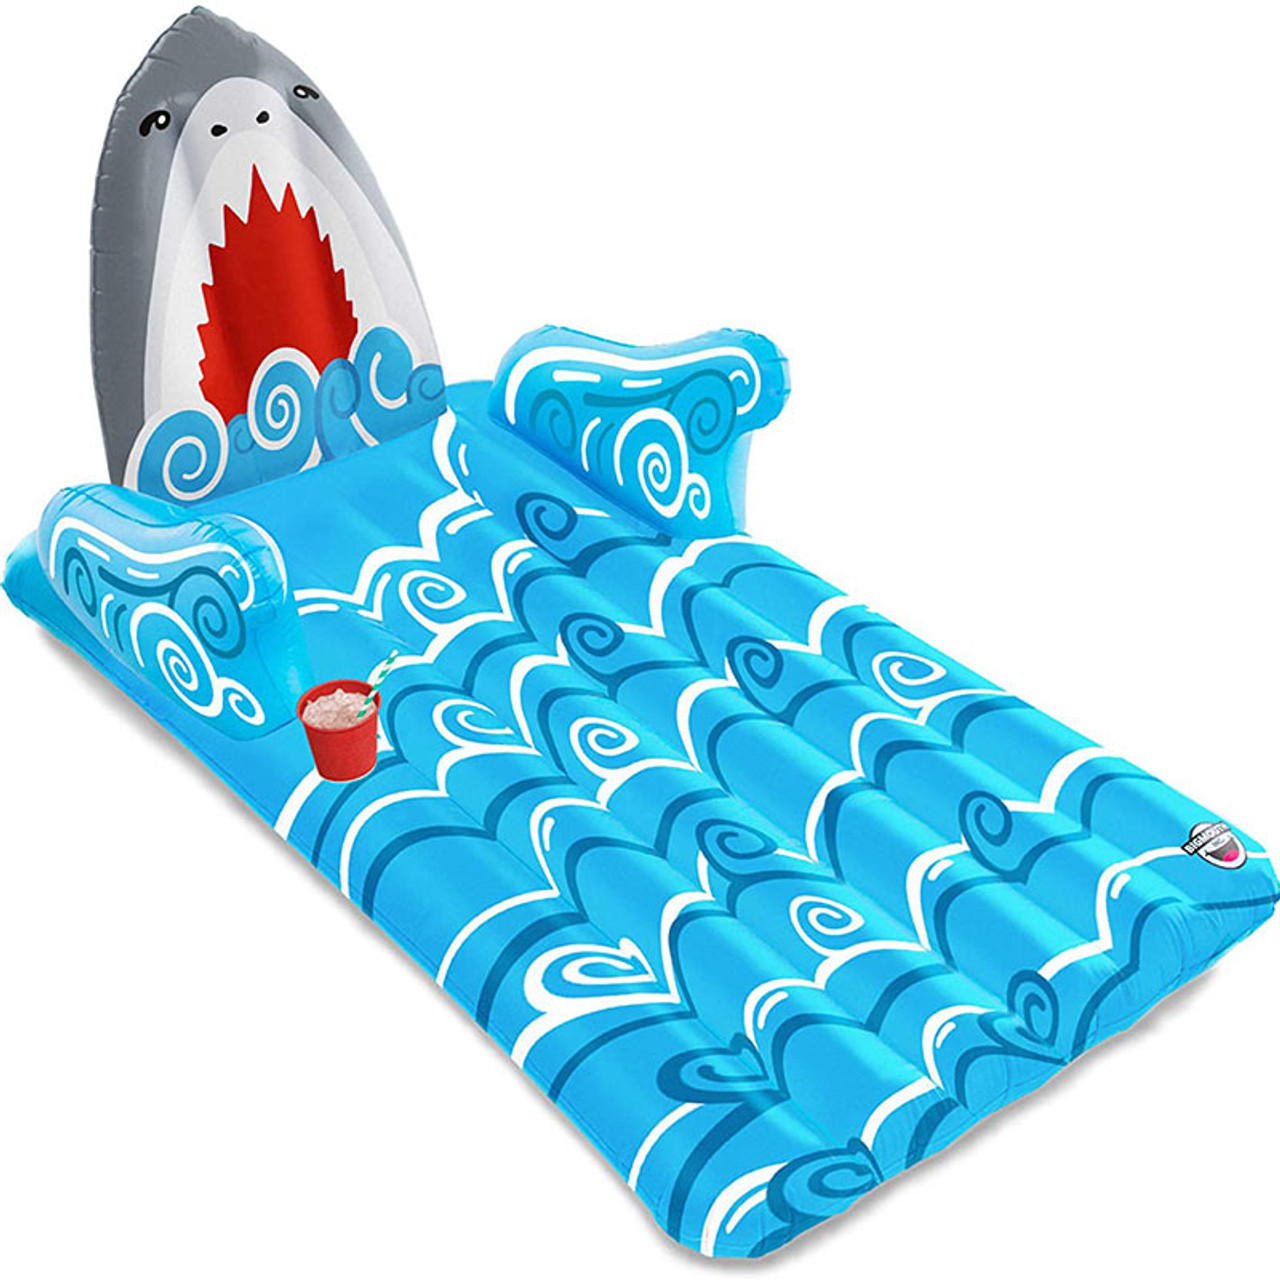 Giant Shark Lounger Pool and Ocean Float